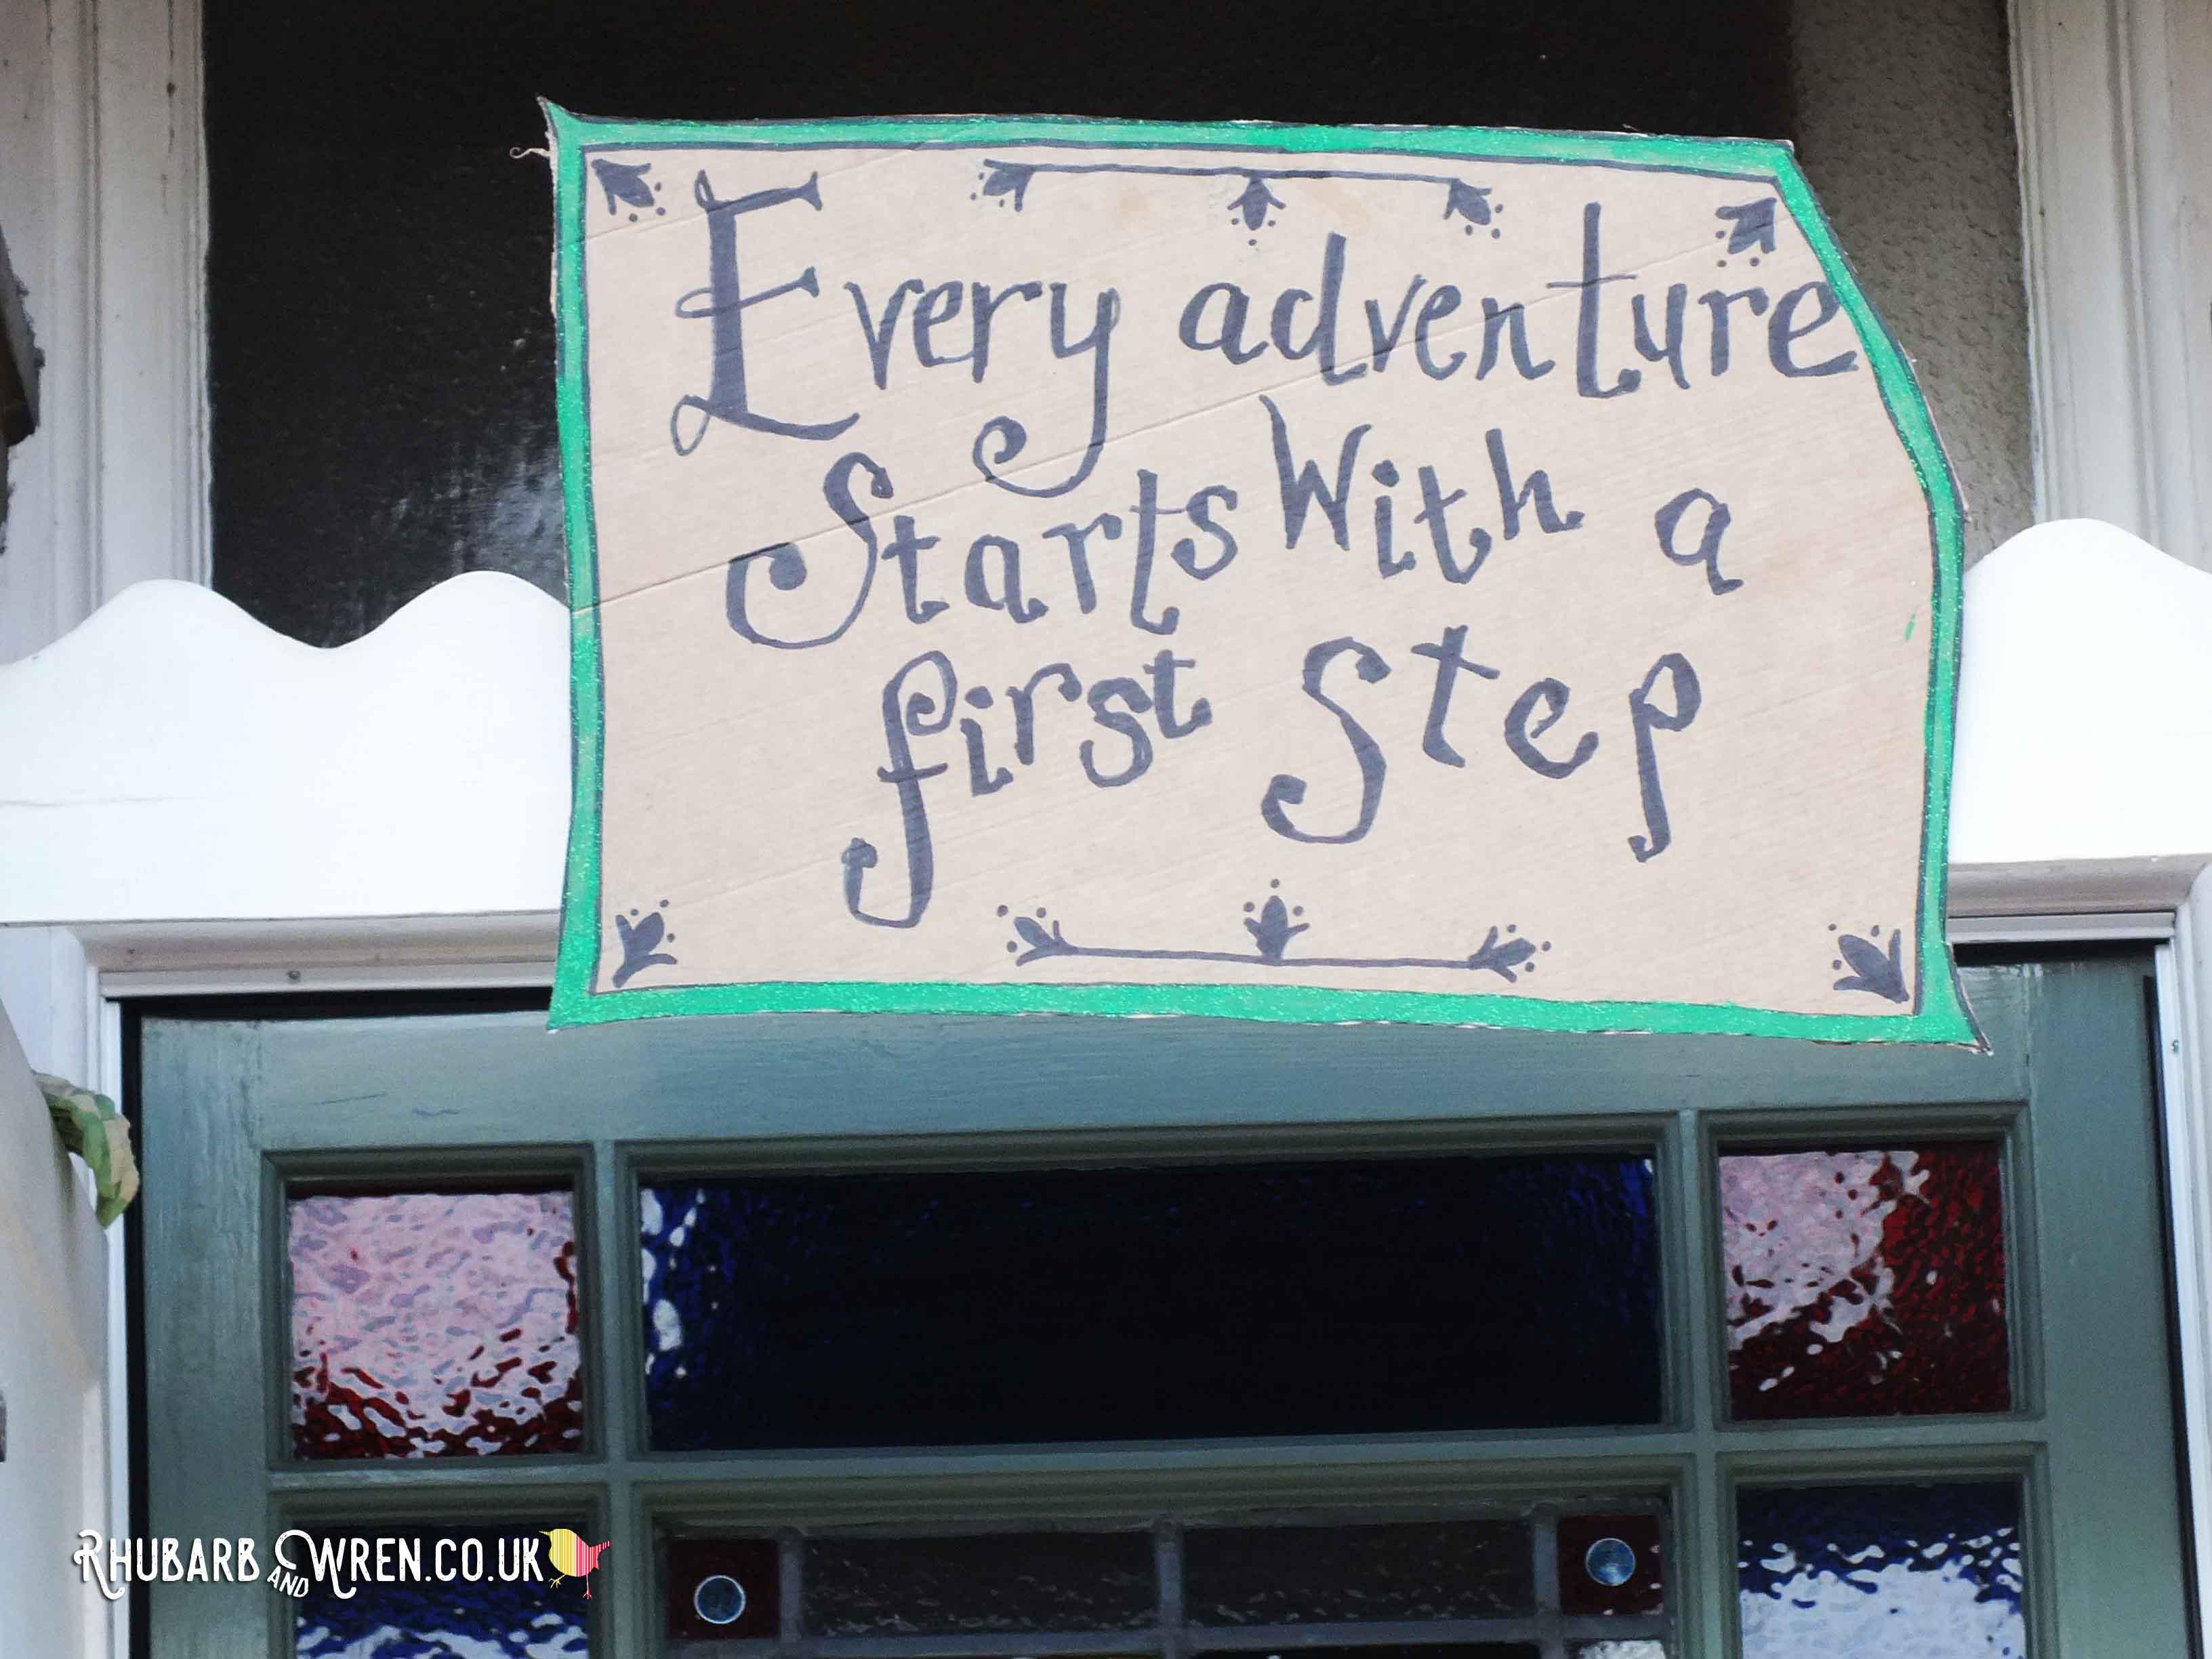 alice_in_wonderland_every_adventure